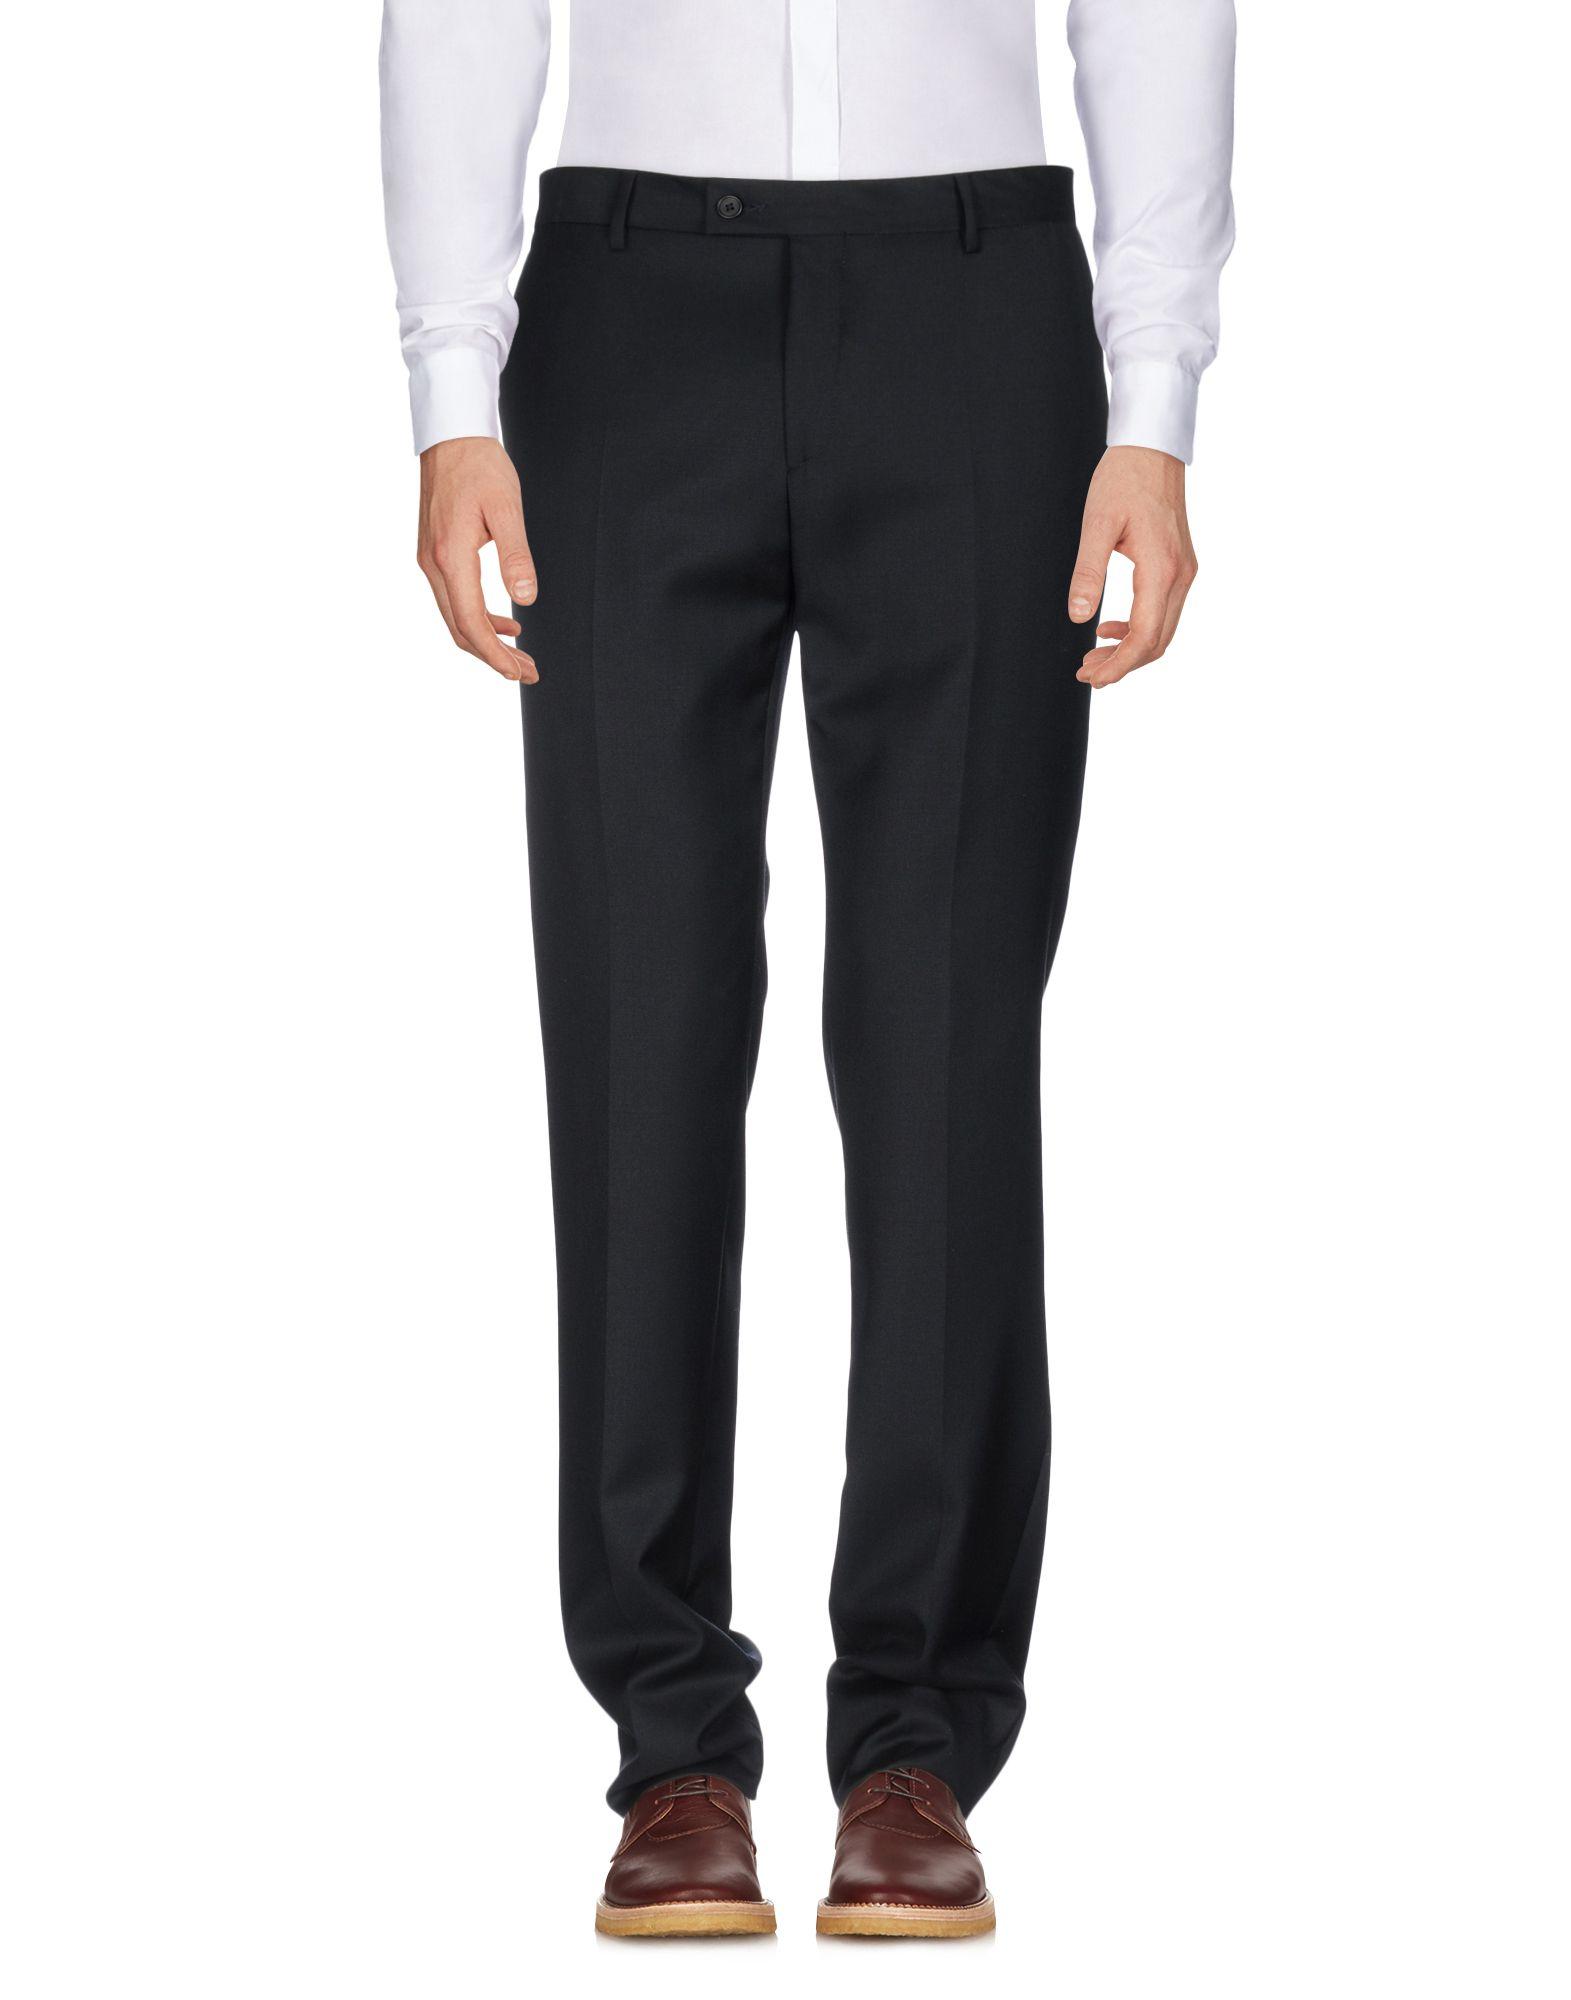 Pantalone Trussardi Donna - Acquista online su